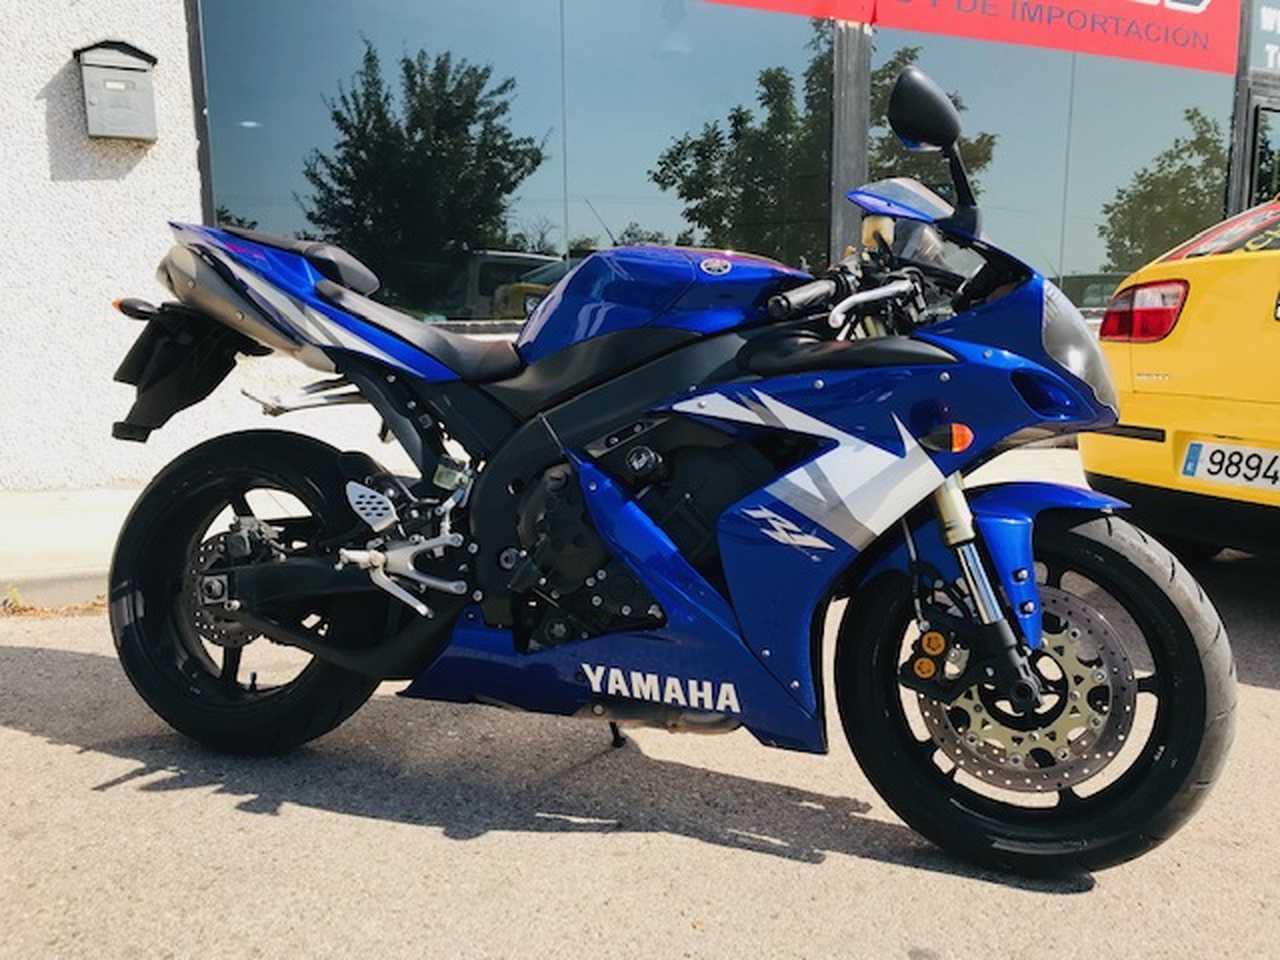 Yamaha YZF-R1M   - Foto 1